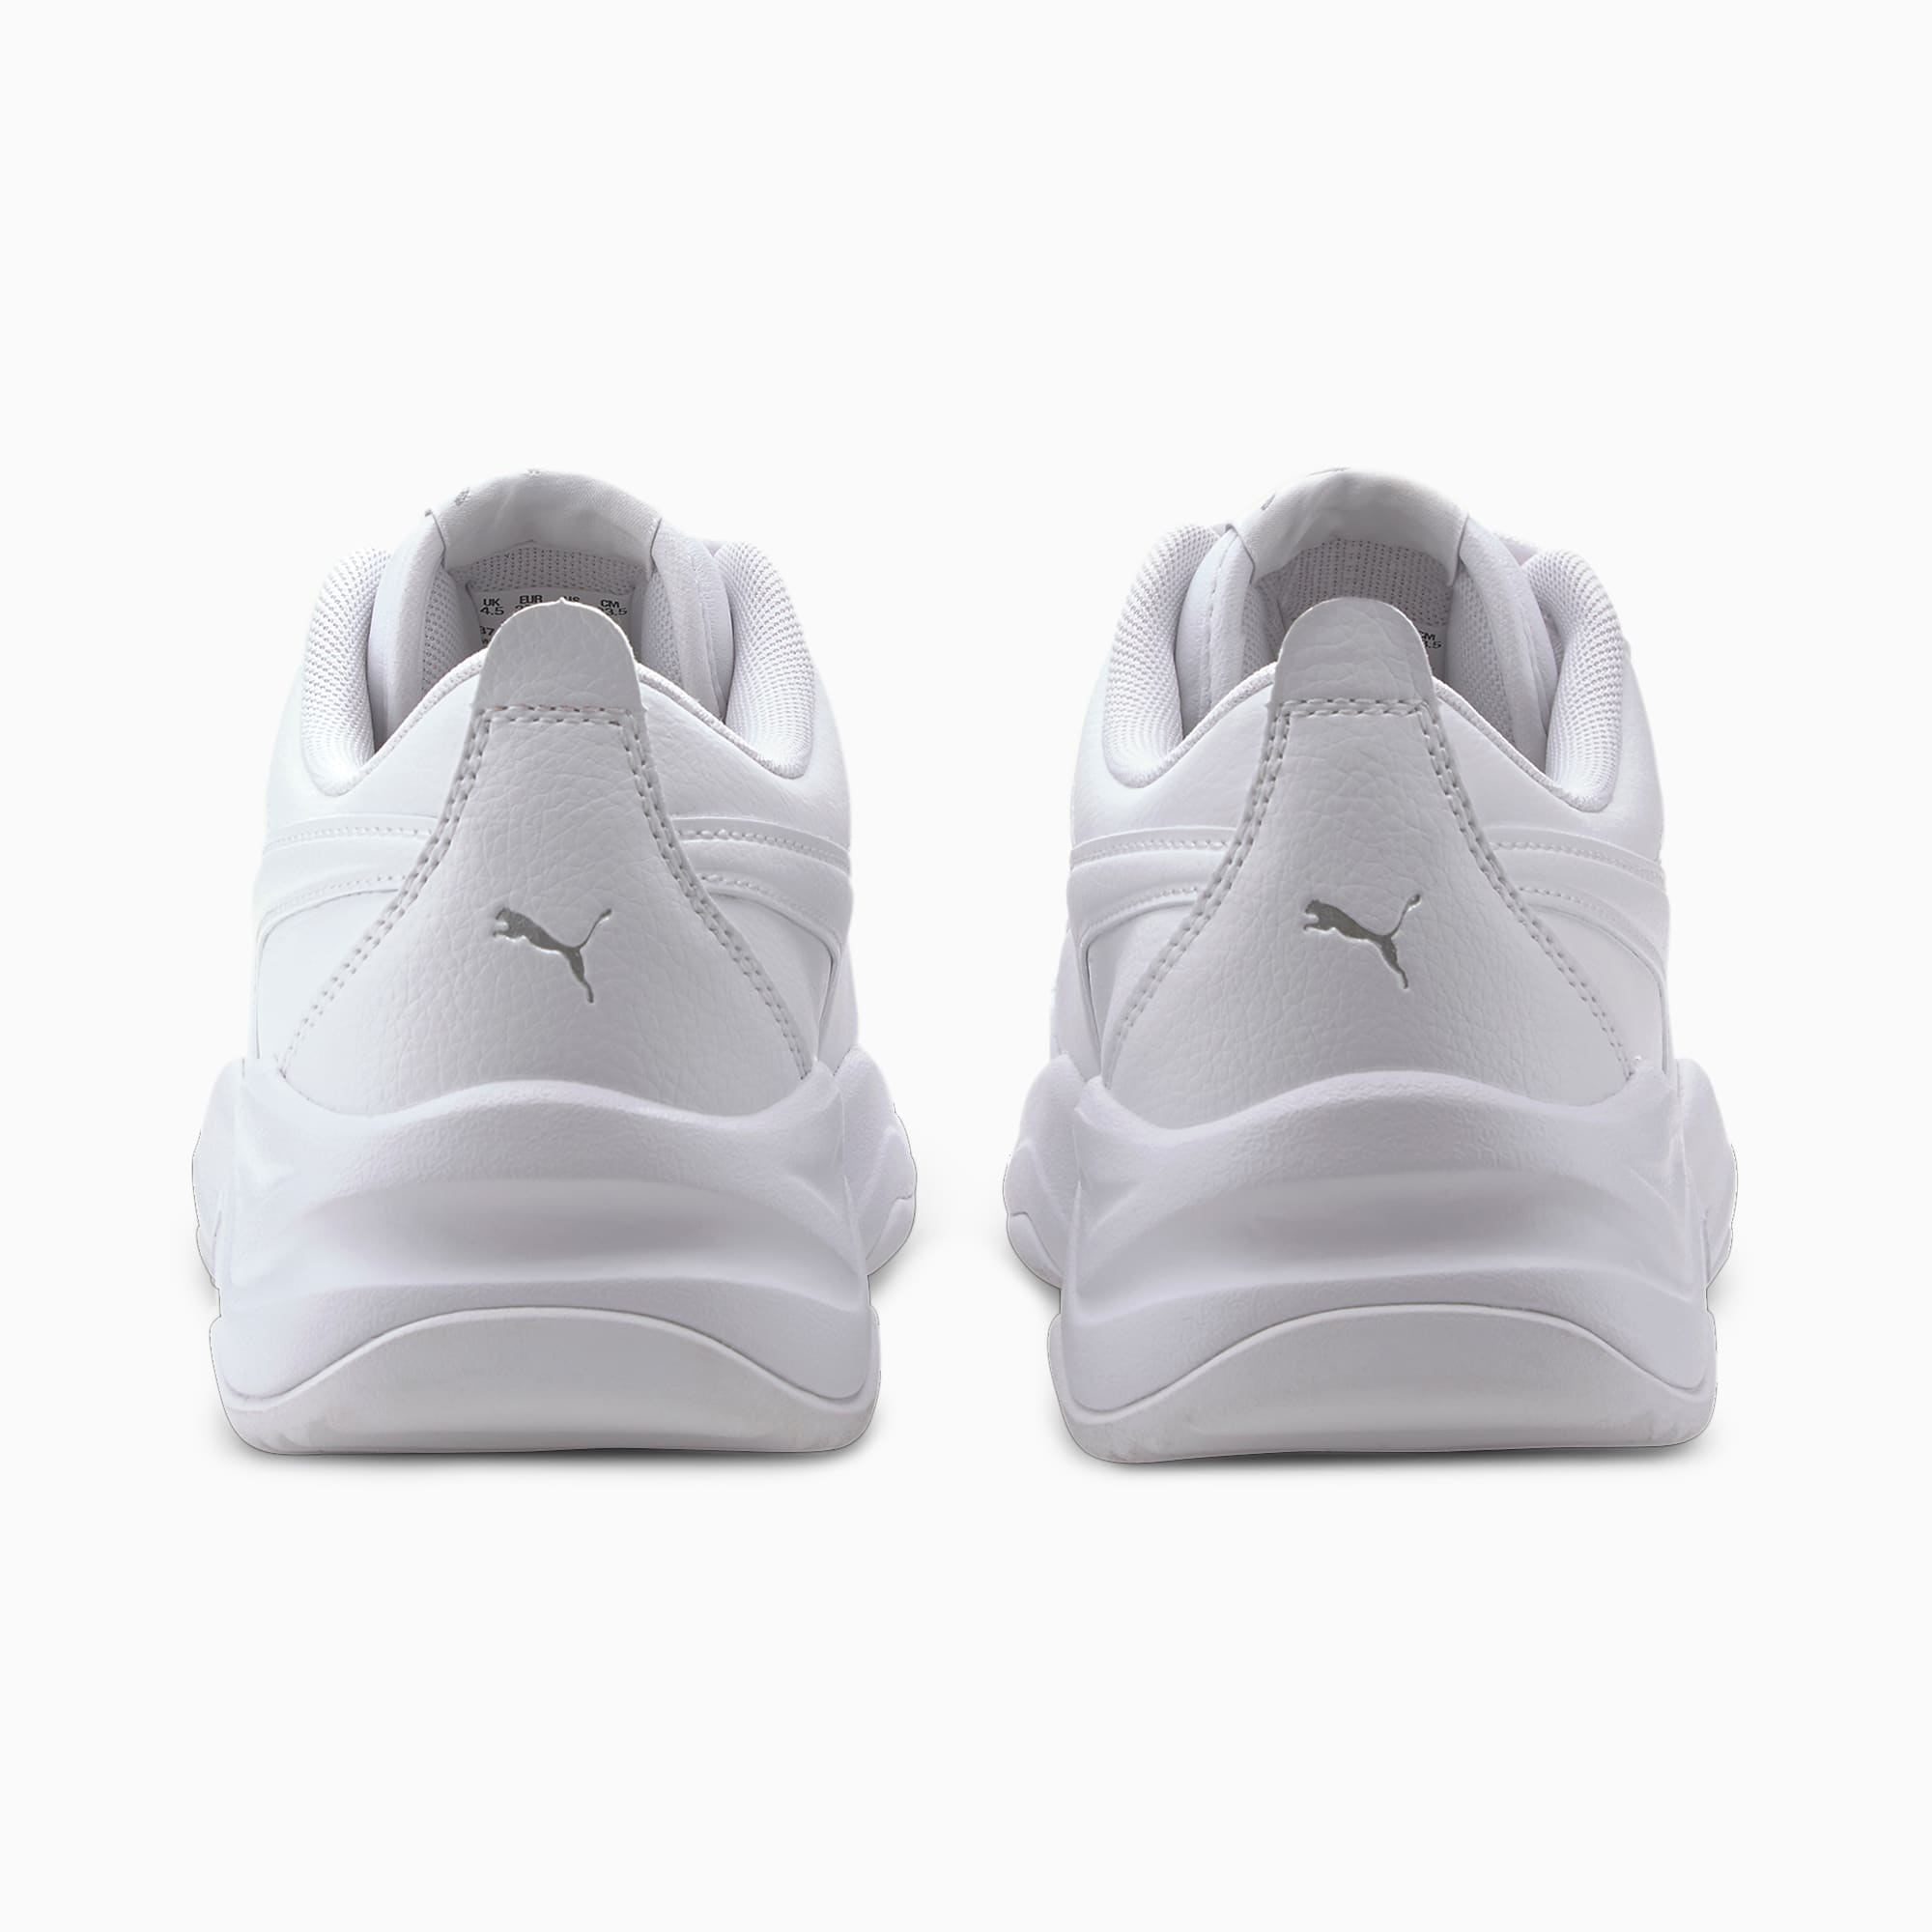 Sneakers PUMA Cilia Mode 371125 02 Puma WhitePuma Silver